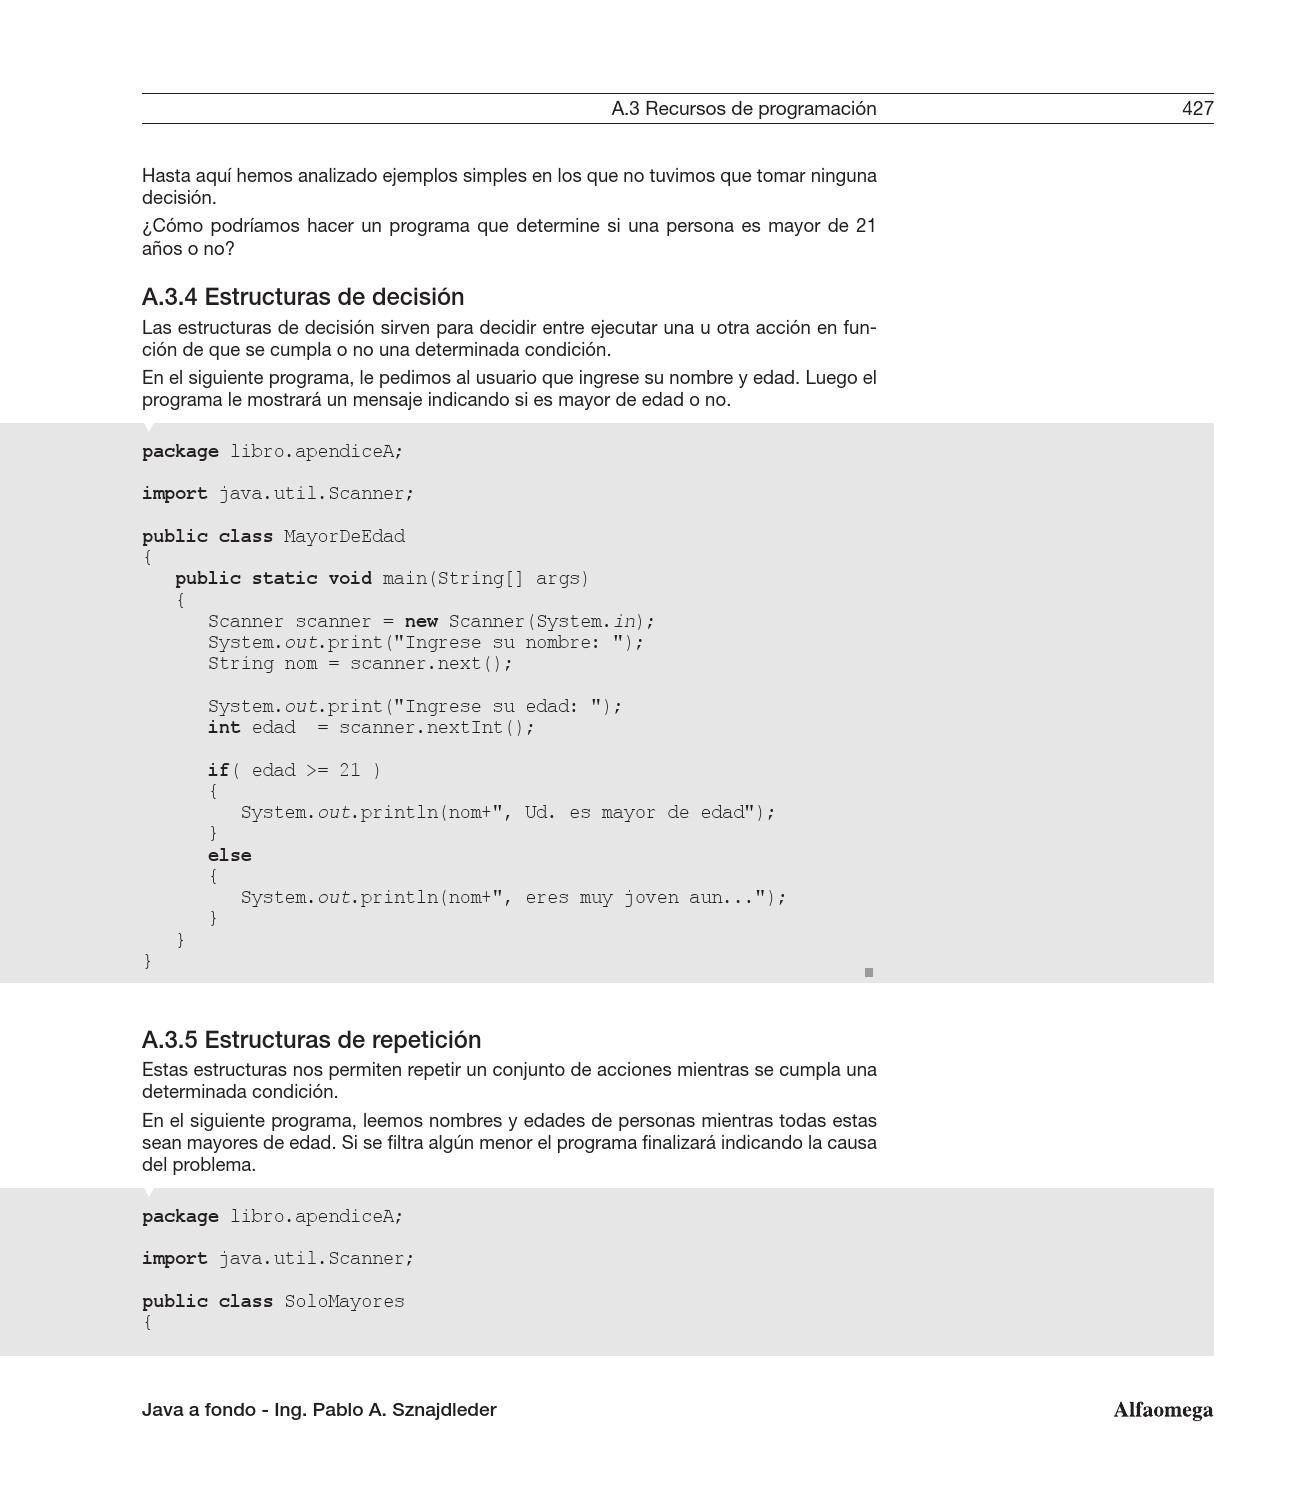 Java A Fondo By Sergio Rivera Issuu